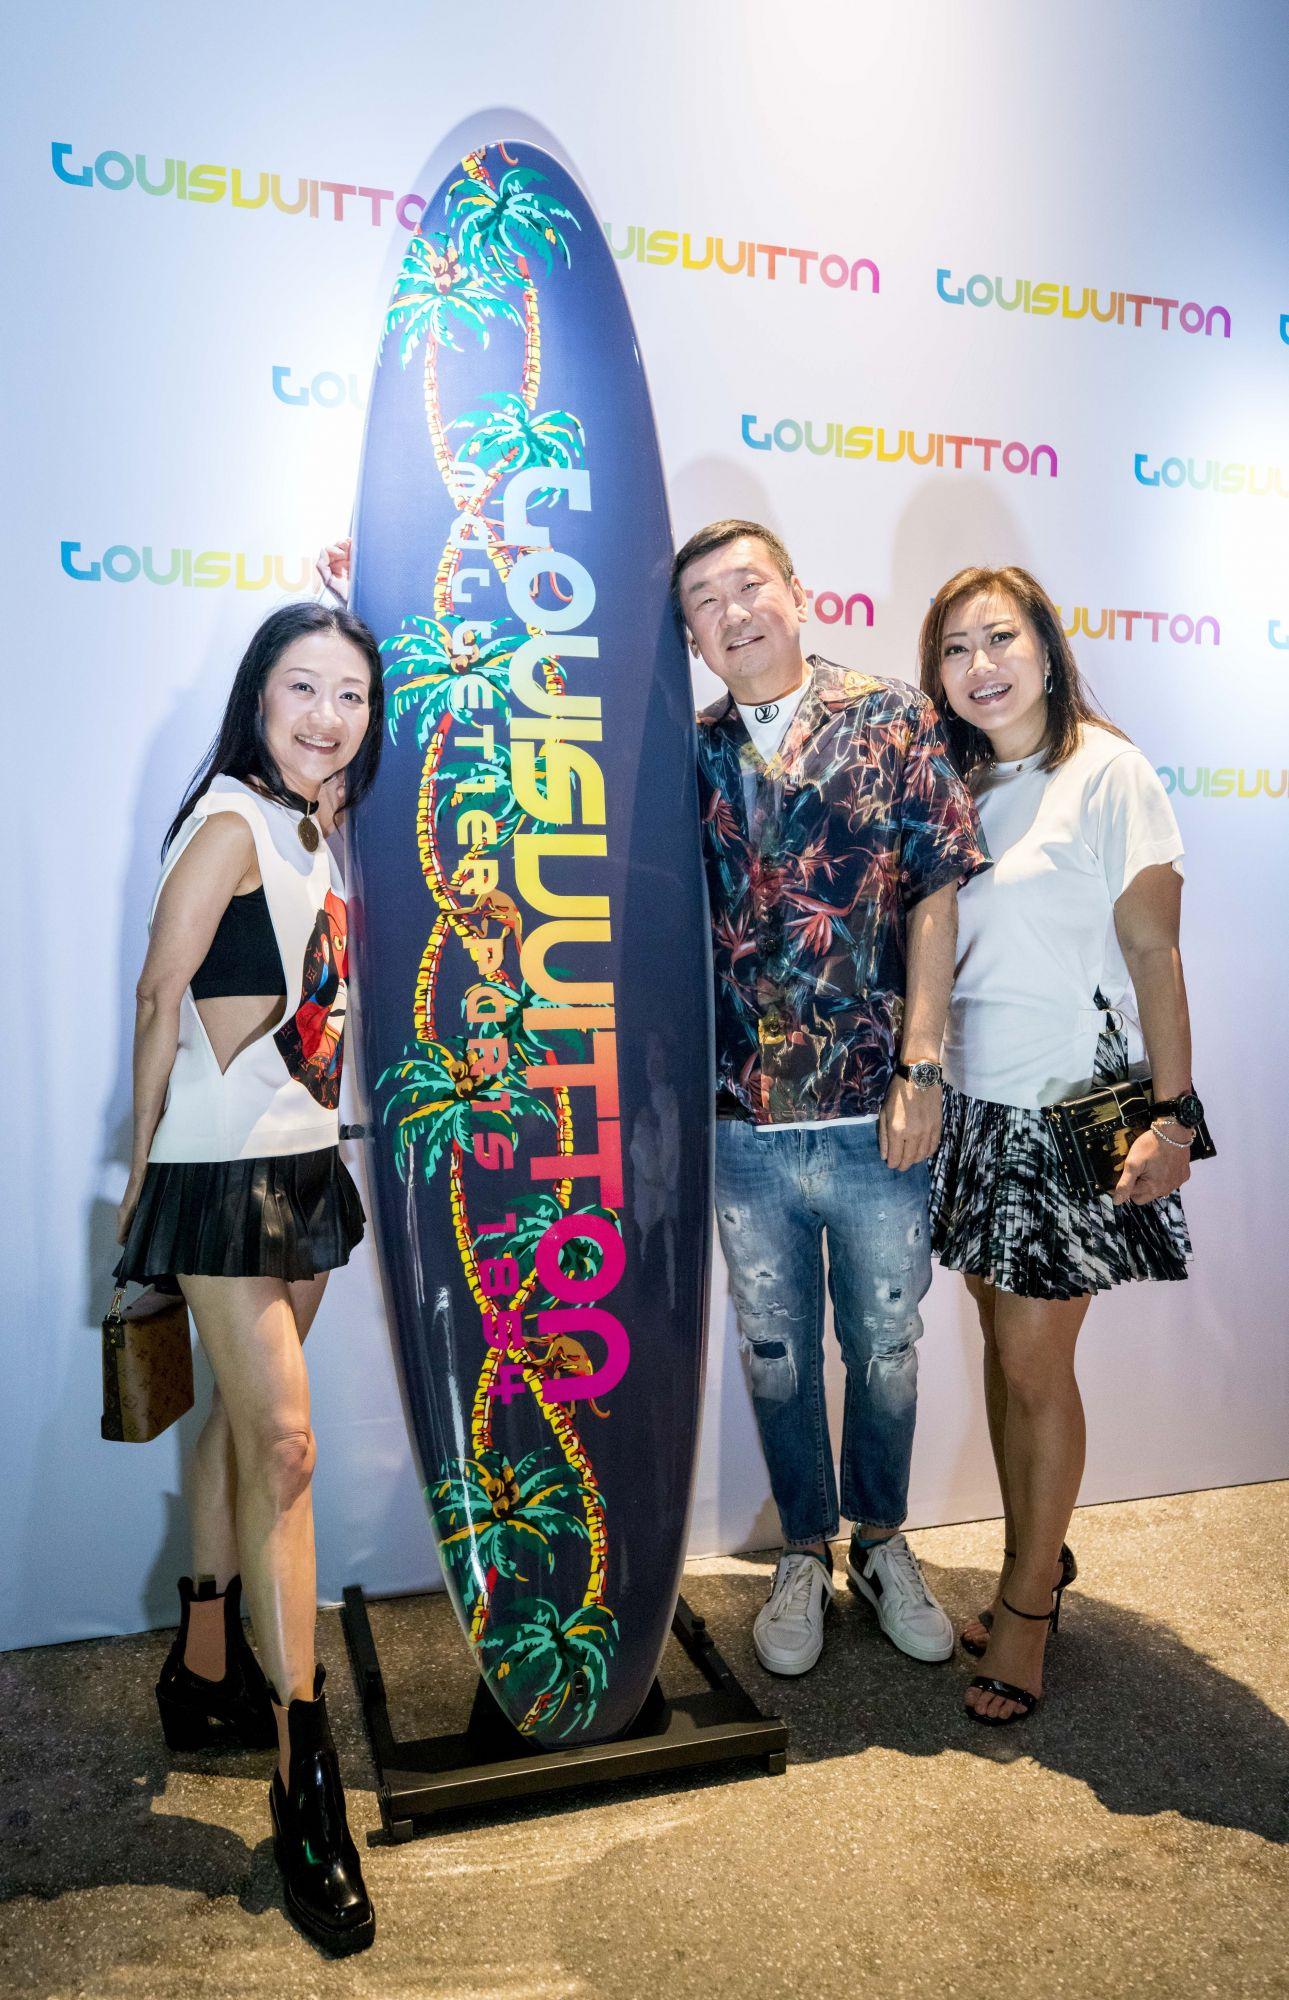 Dana Cheong, Darren Cheong, Ingrid Prasatya